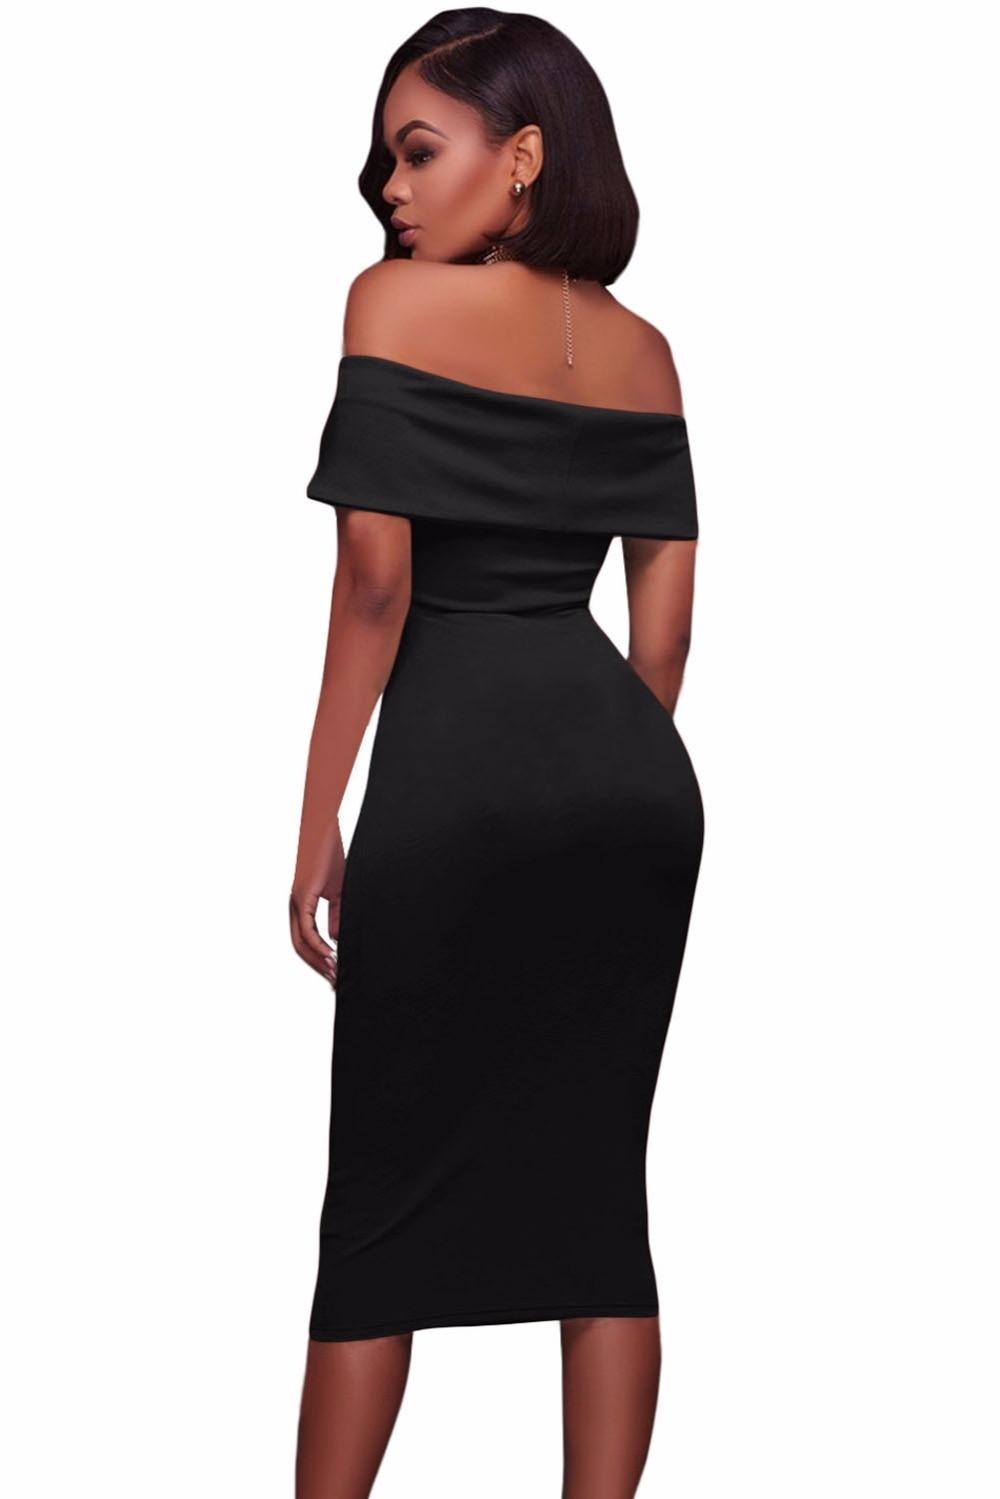 Black-Ruched-Off-Shoulder-Bodycon-Midi-Dress-LC61507-2-3